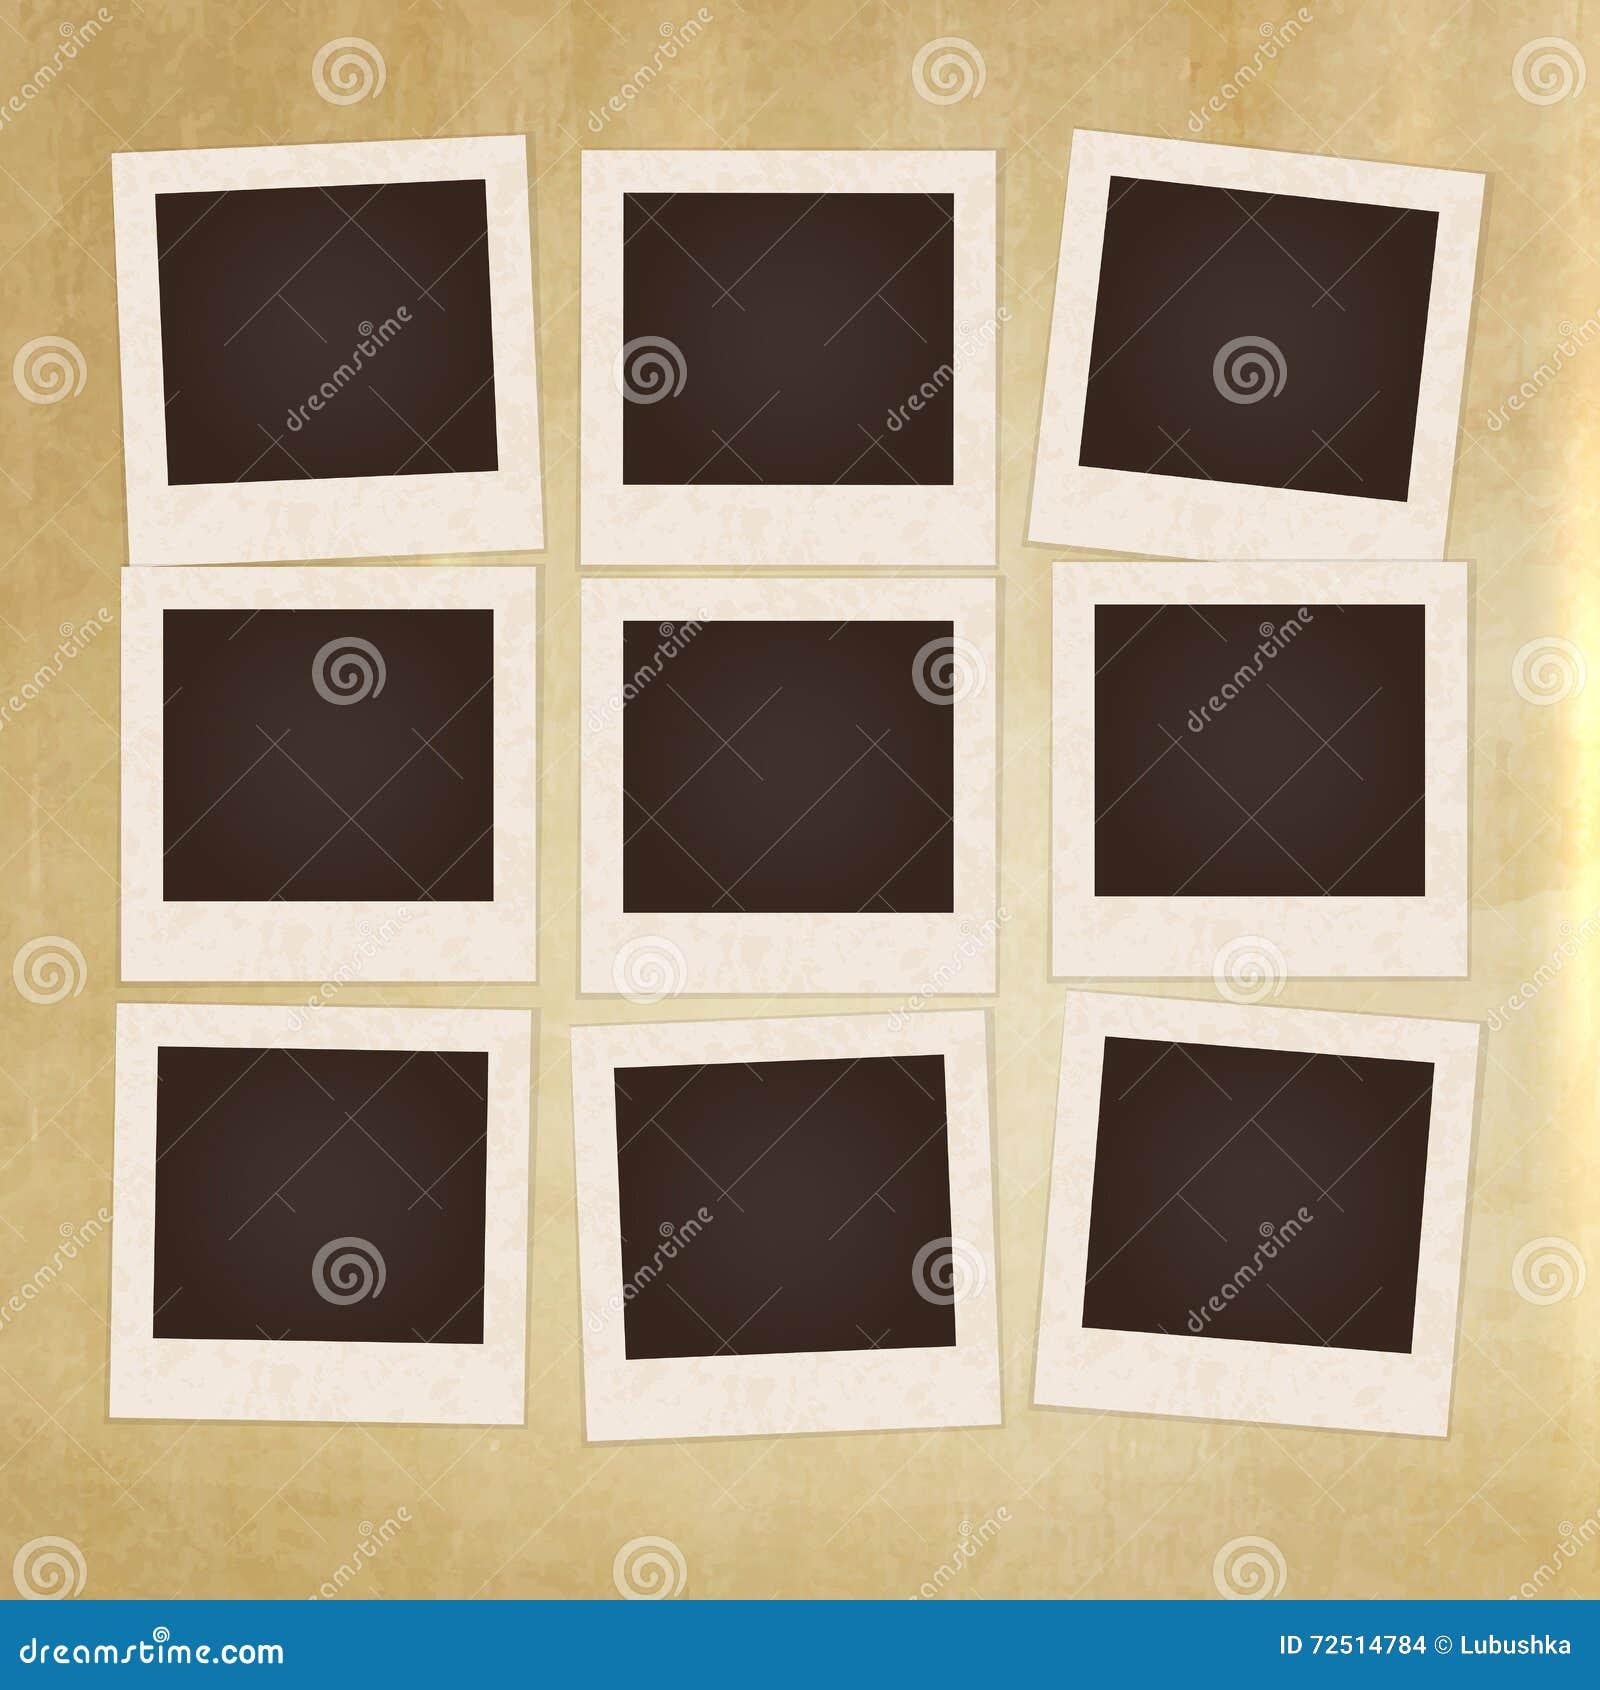 Vintage photo frame stock vector. Illustration of love - 72514784